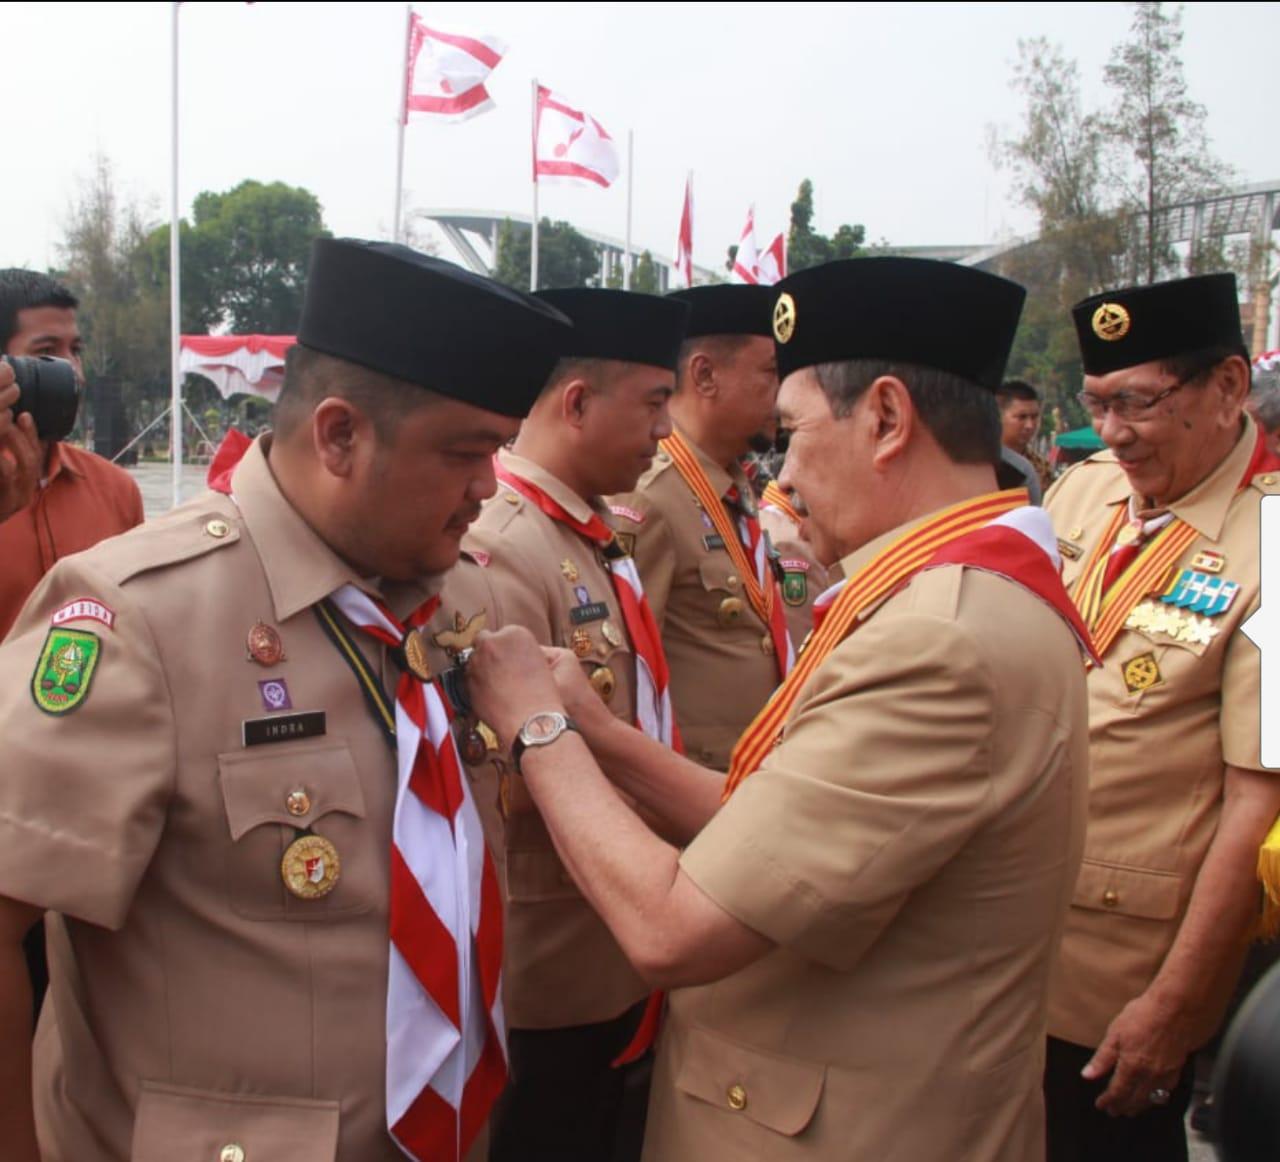 Mantan Ketua Kwartir Ranting Tembilahan Masa Bakti 2009 - 2012 Terima Lencana Pancawarsa